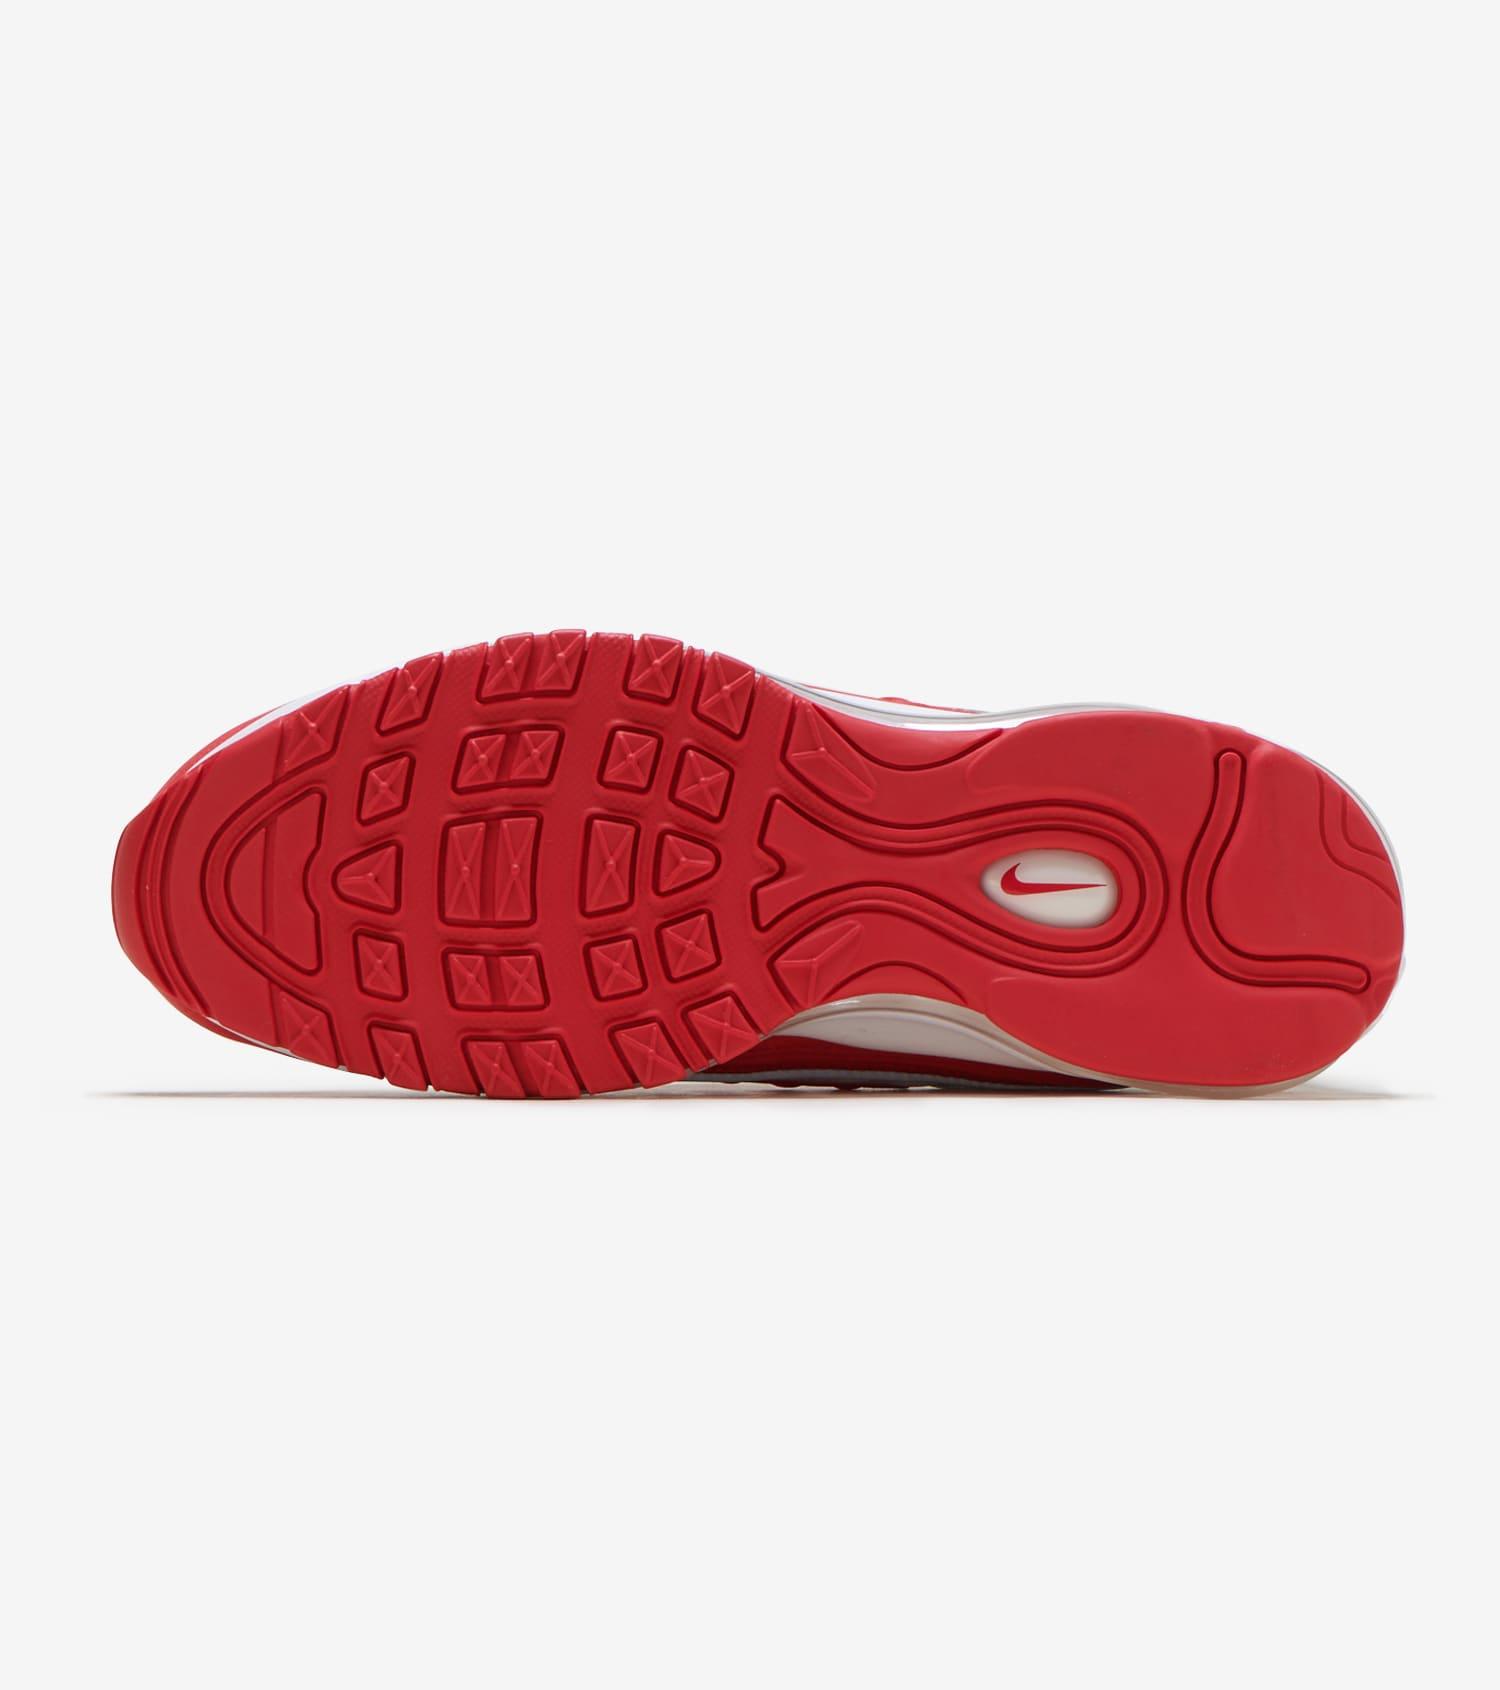 Nike Air Max 98 Older Kids' Shoe Red | BV4872 600 | FOOTY.COM